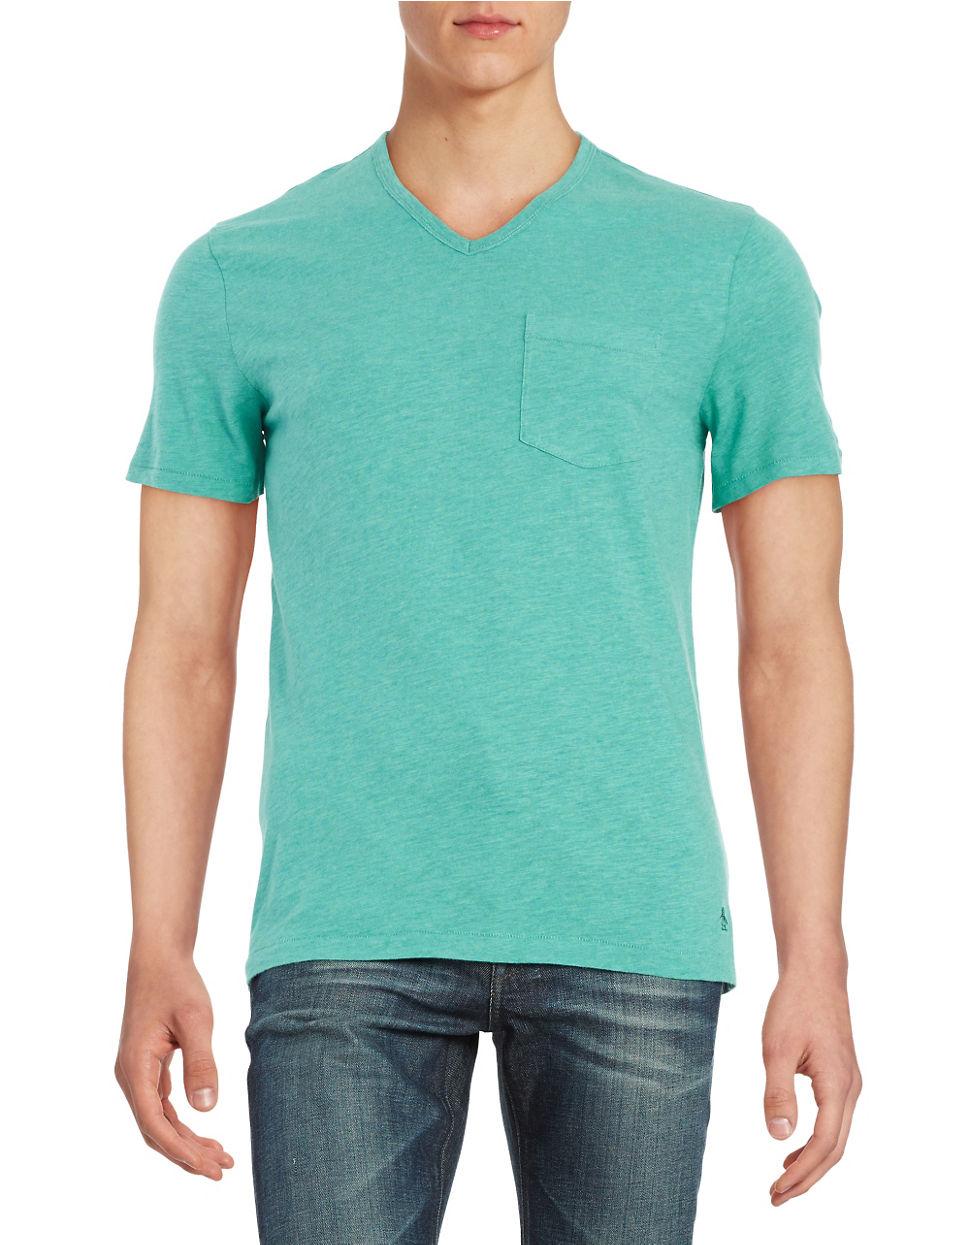 Lyst original penguin v neck pocket tee in blue for men for Men s v neck pocket tee shirts